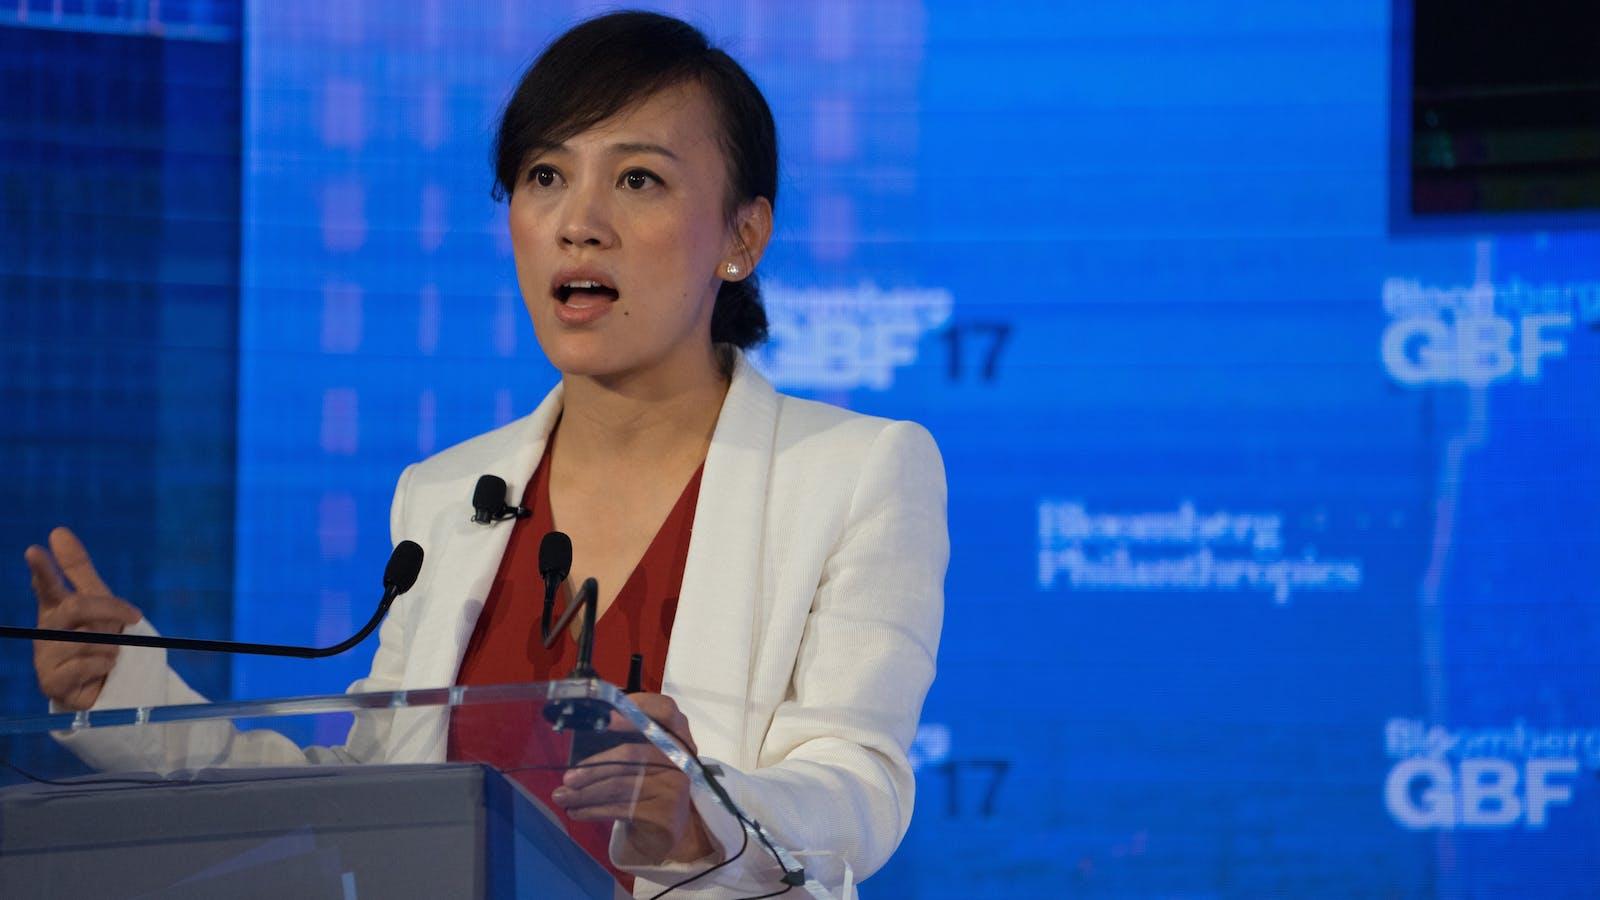 Didi President Jean Liu. Photo by Bloomberg.